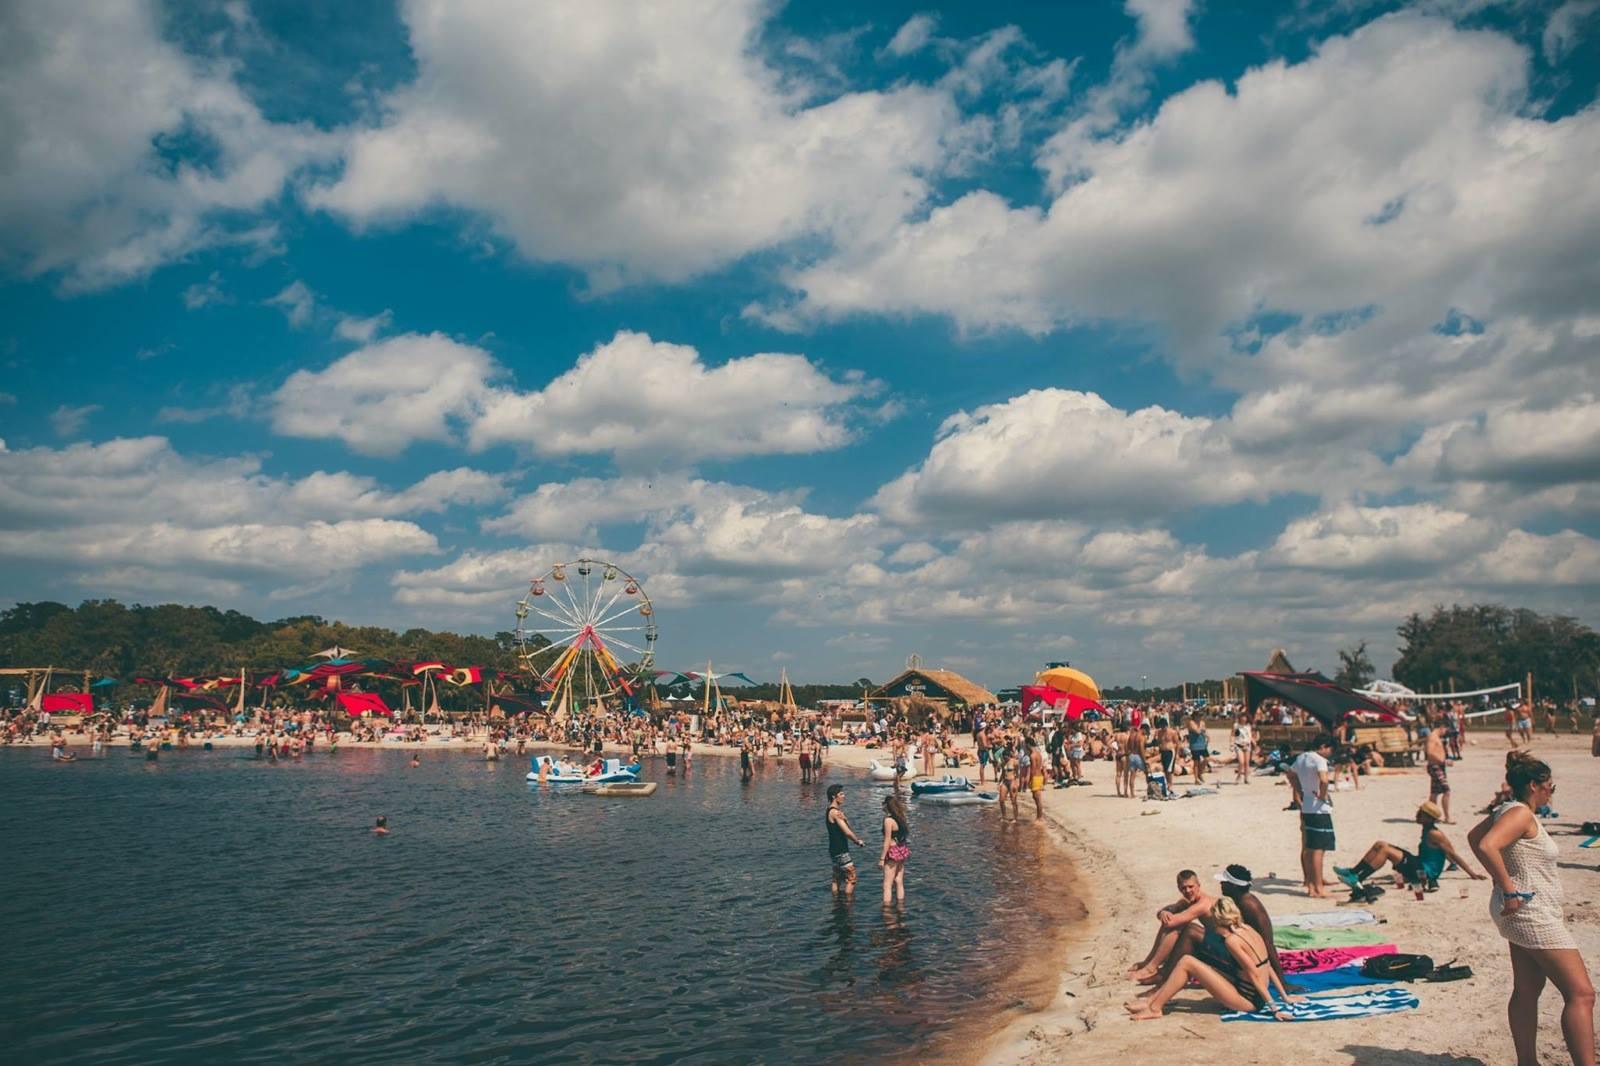 Okeechobee Festival 2017 Initial Lineup Announced